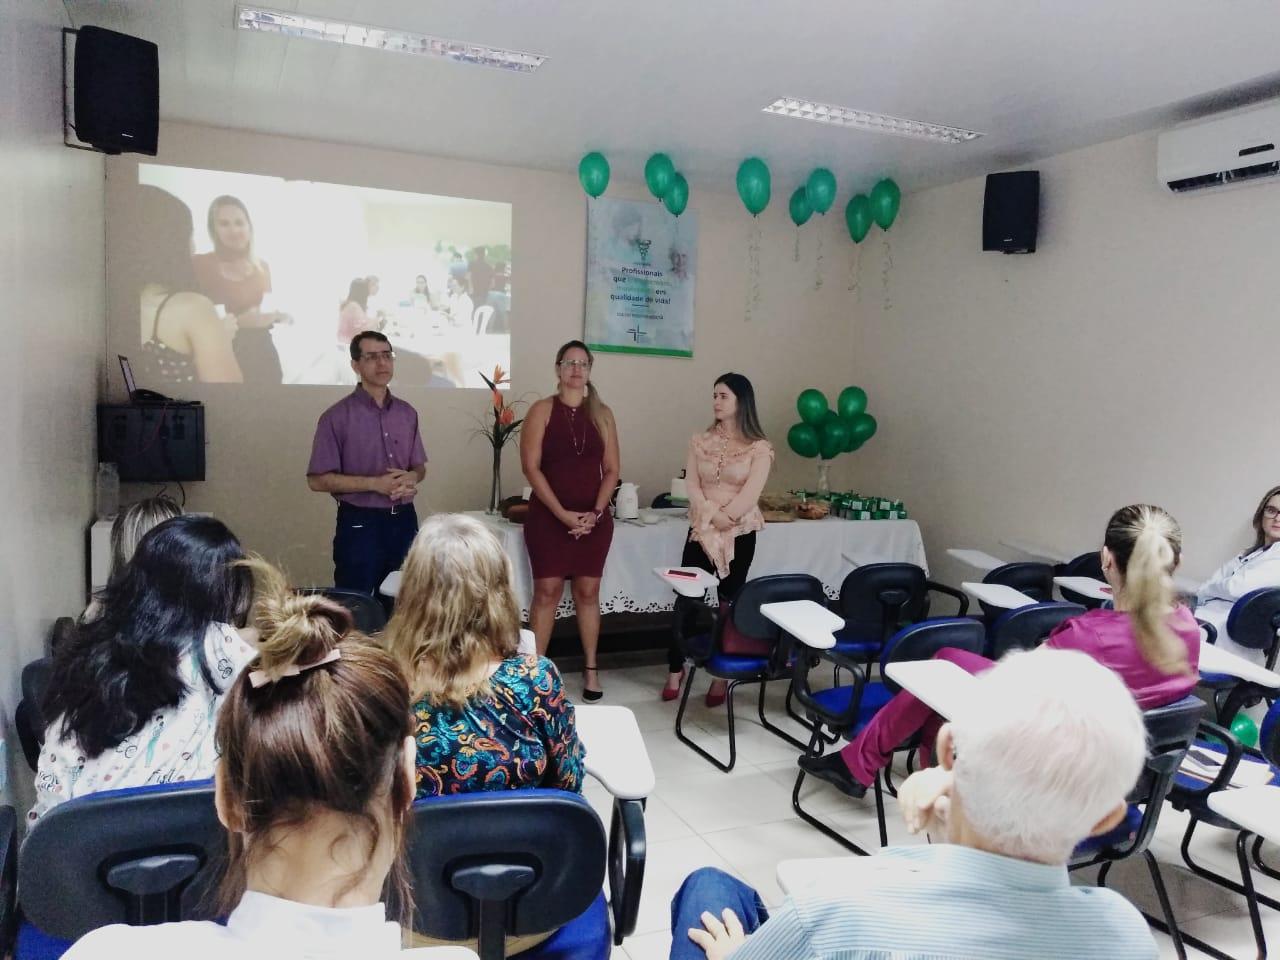 Hospital de Arapiraca comemora dia do Fisioterapeuta